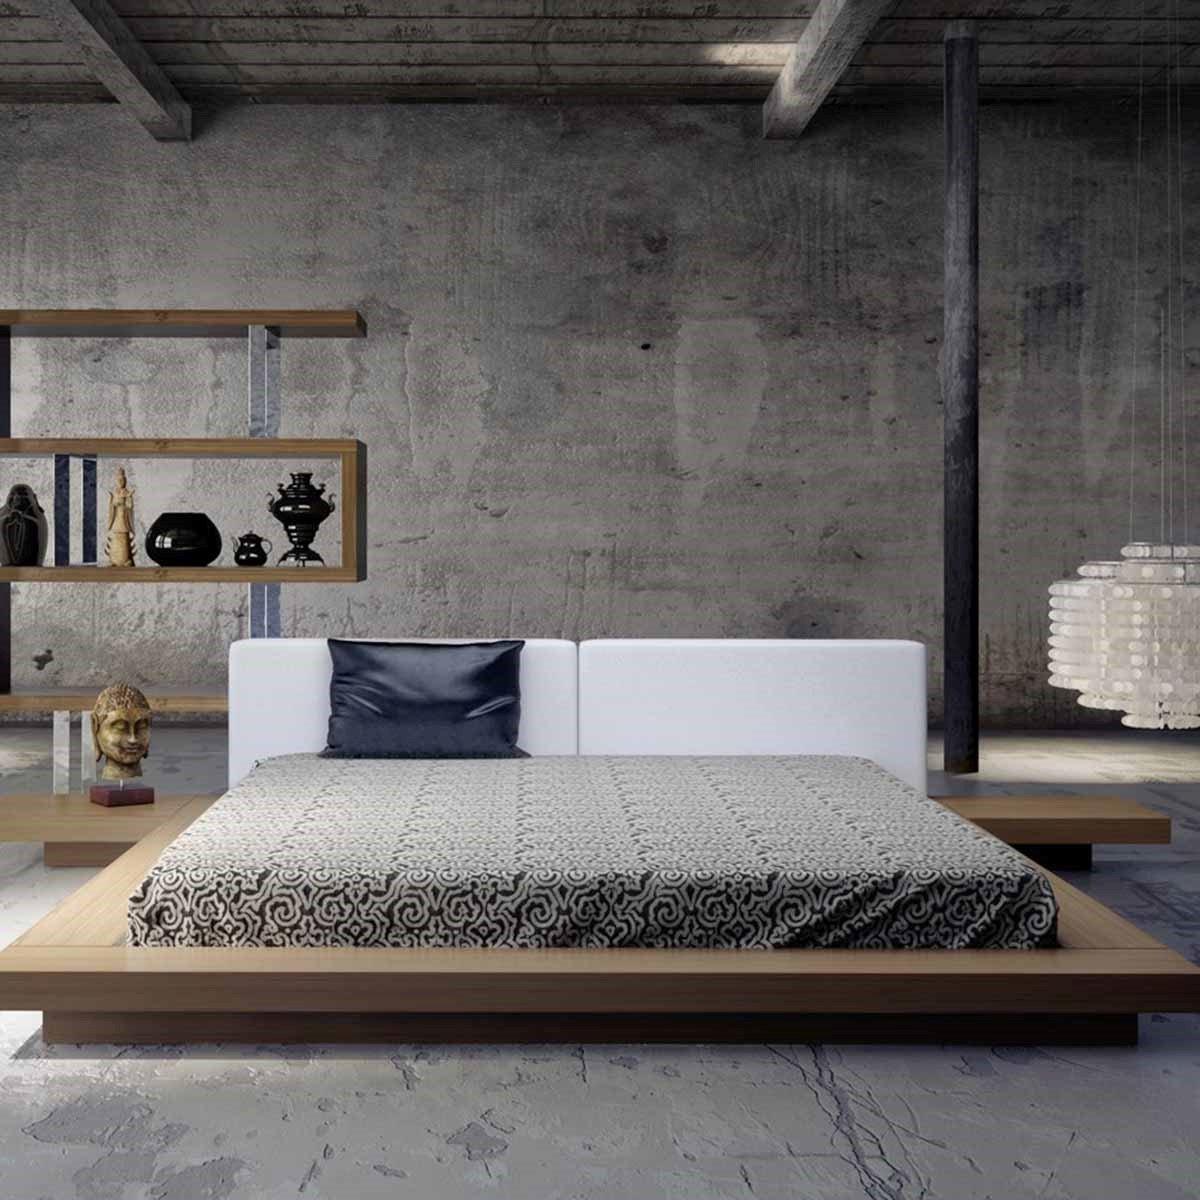 giường gỗ 1m8 2m kiểu nhật